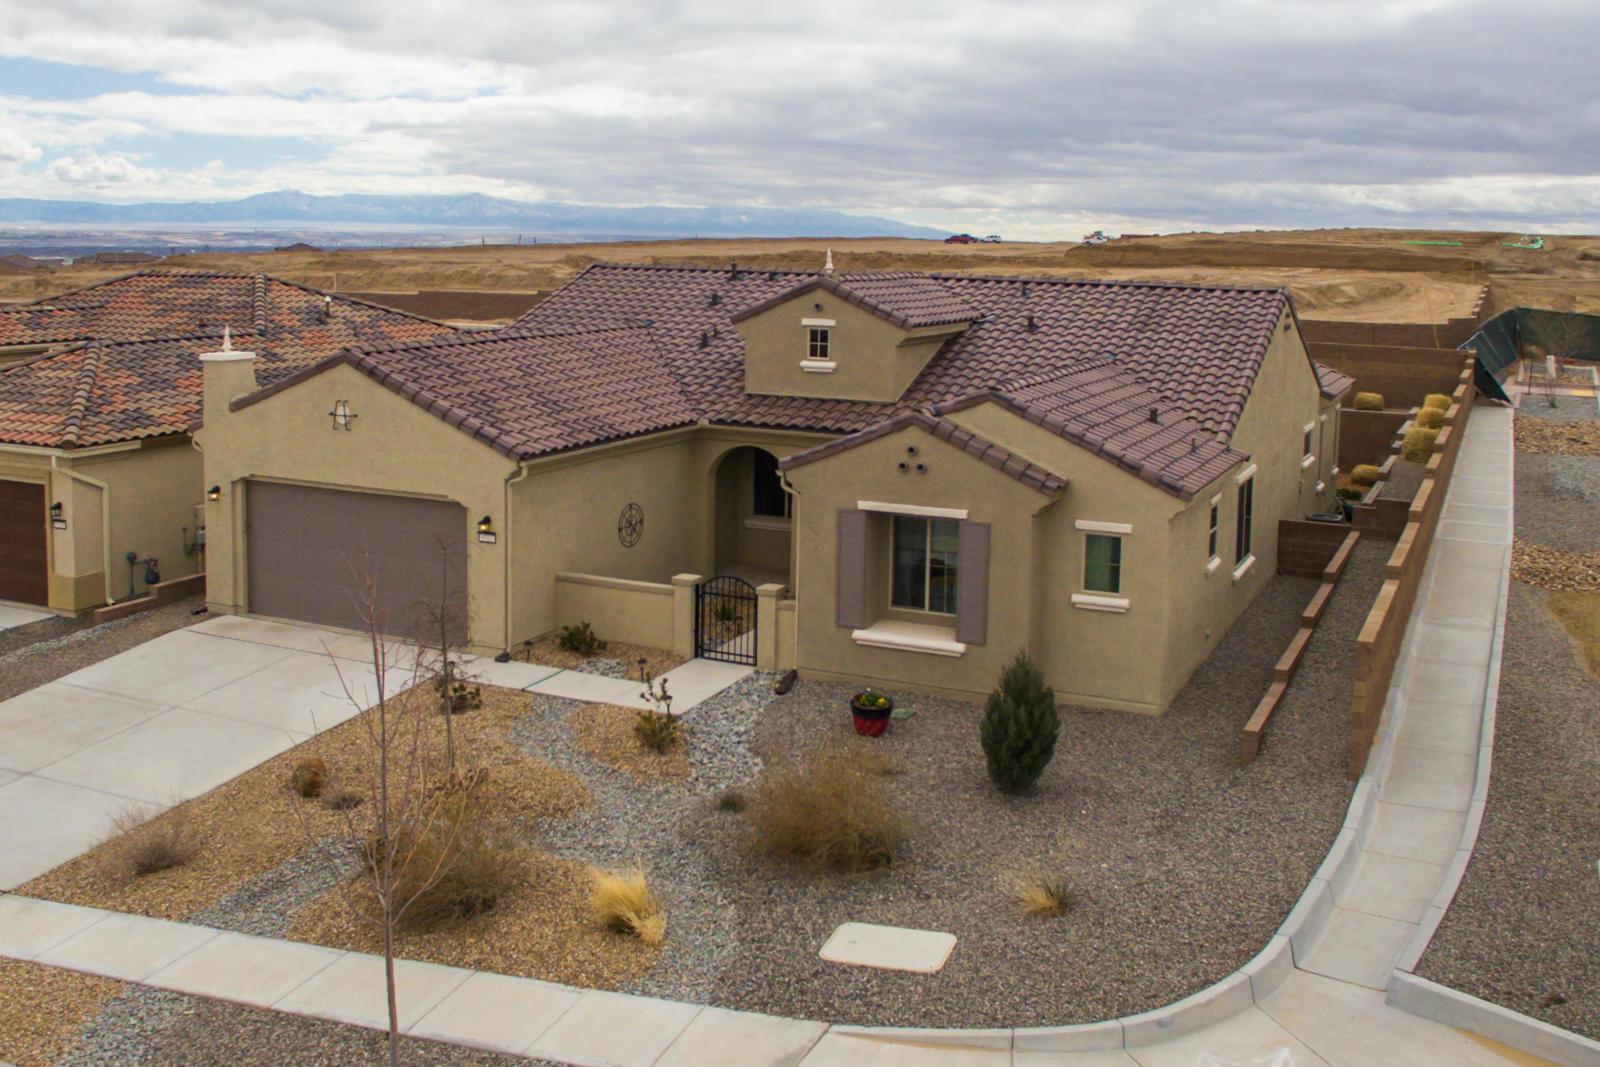 9332 NW Iron Creek Lane, Northwest Albuquerque and Northwest Heights, New Mexico